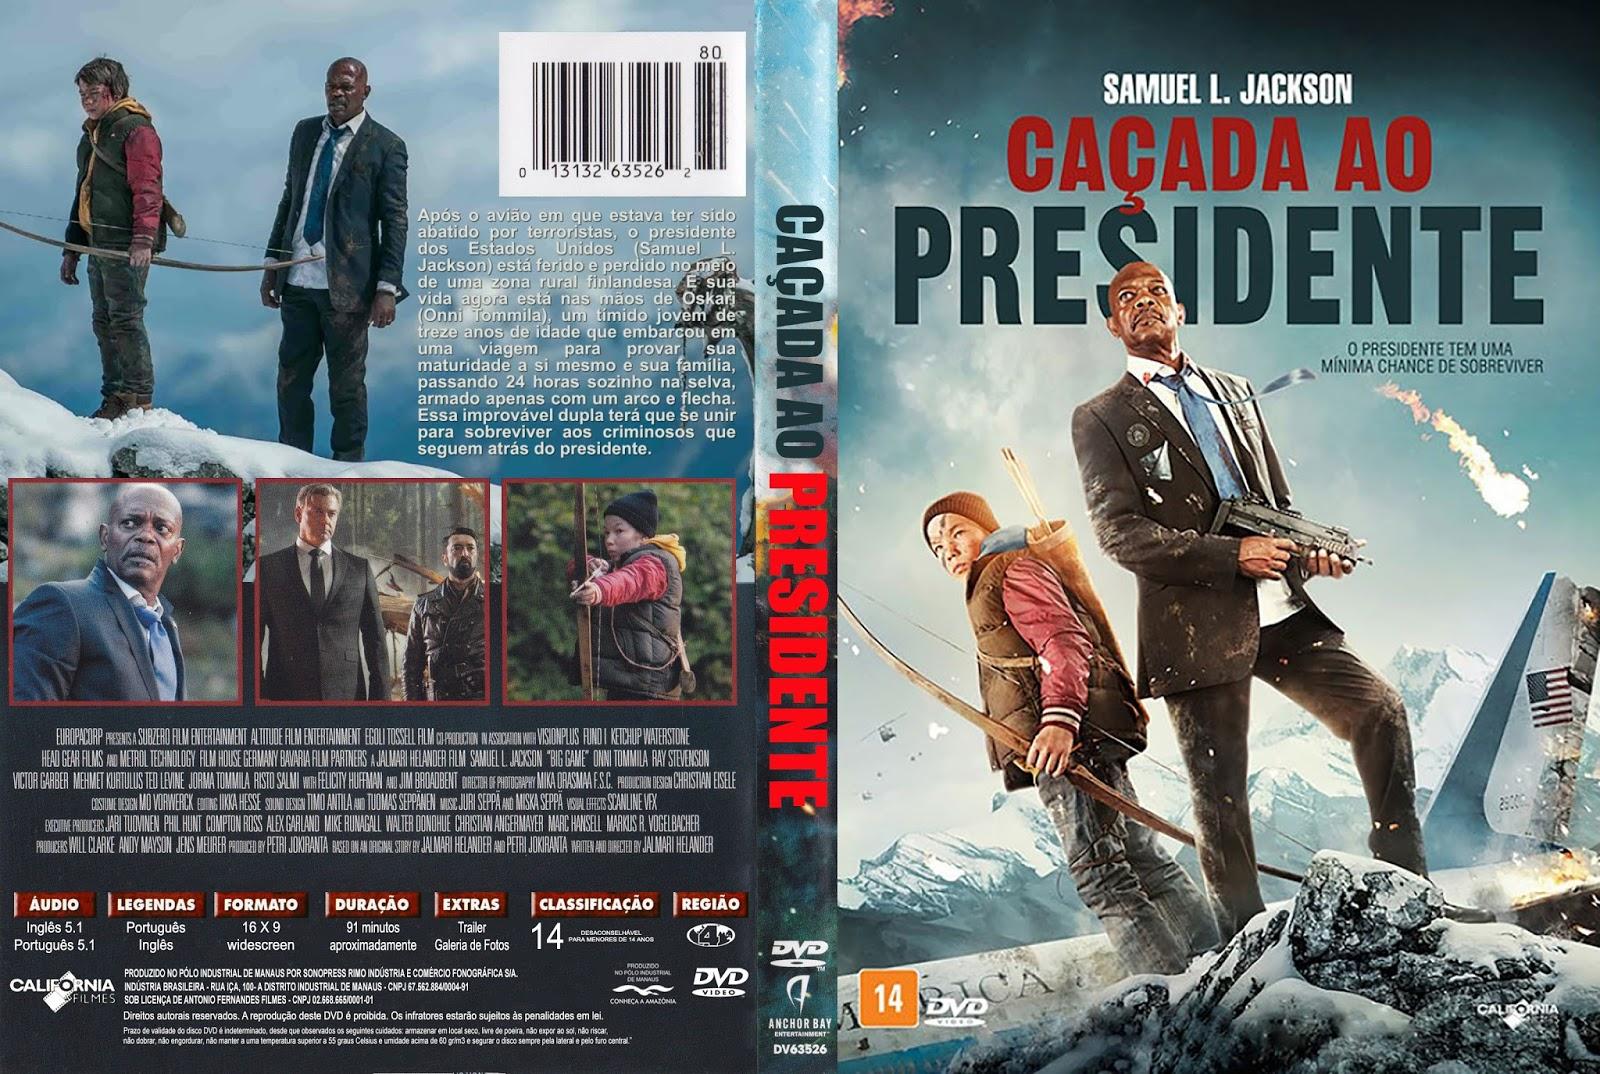 Download Caçada ao Presidente DVD-R Ca 25C3 25A7ada 2Bao 2BPresidente 2BXANDAODOWNLOAD